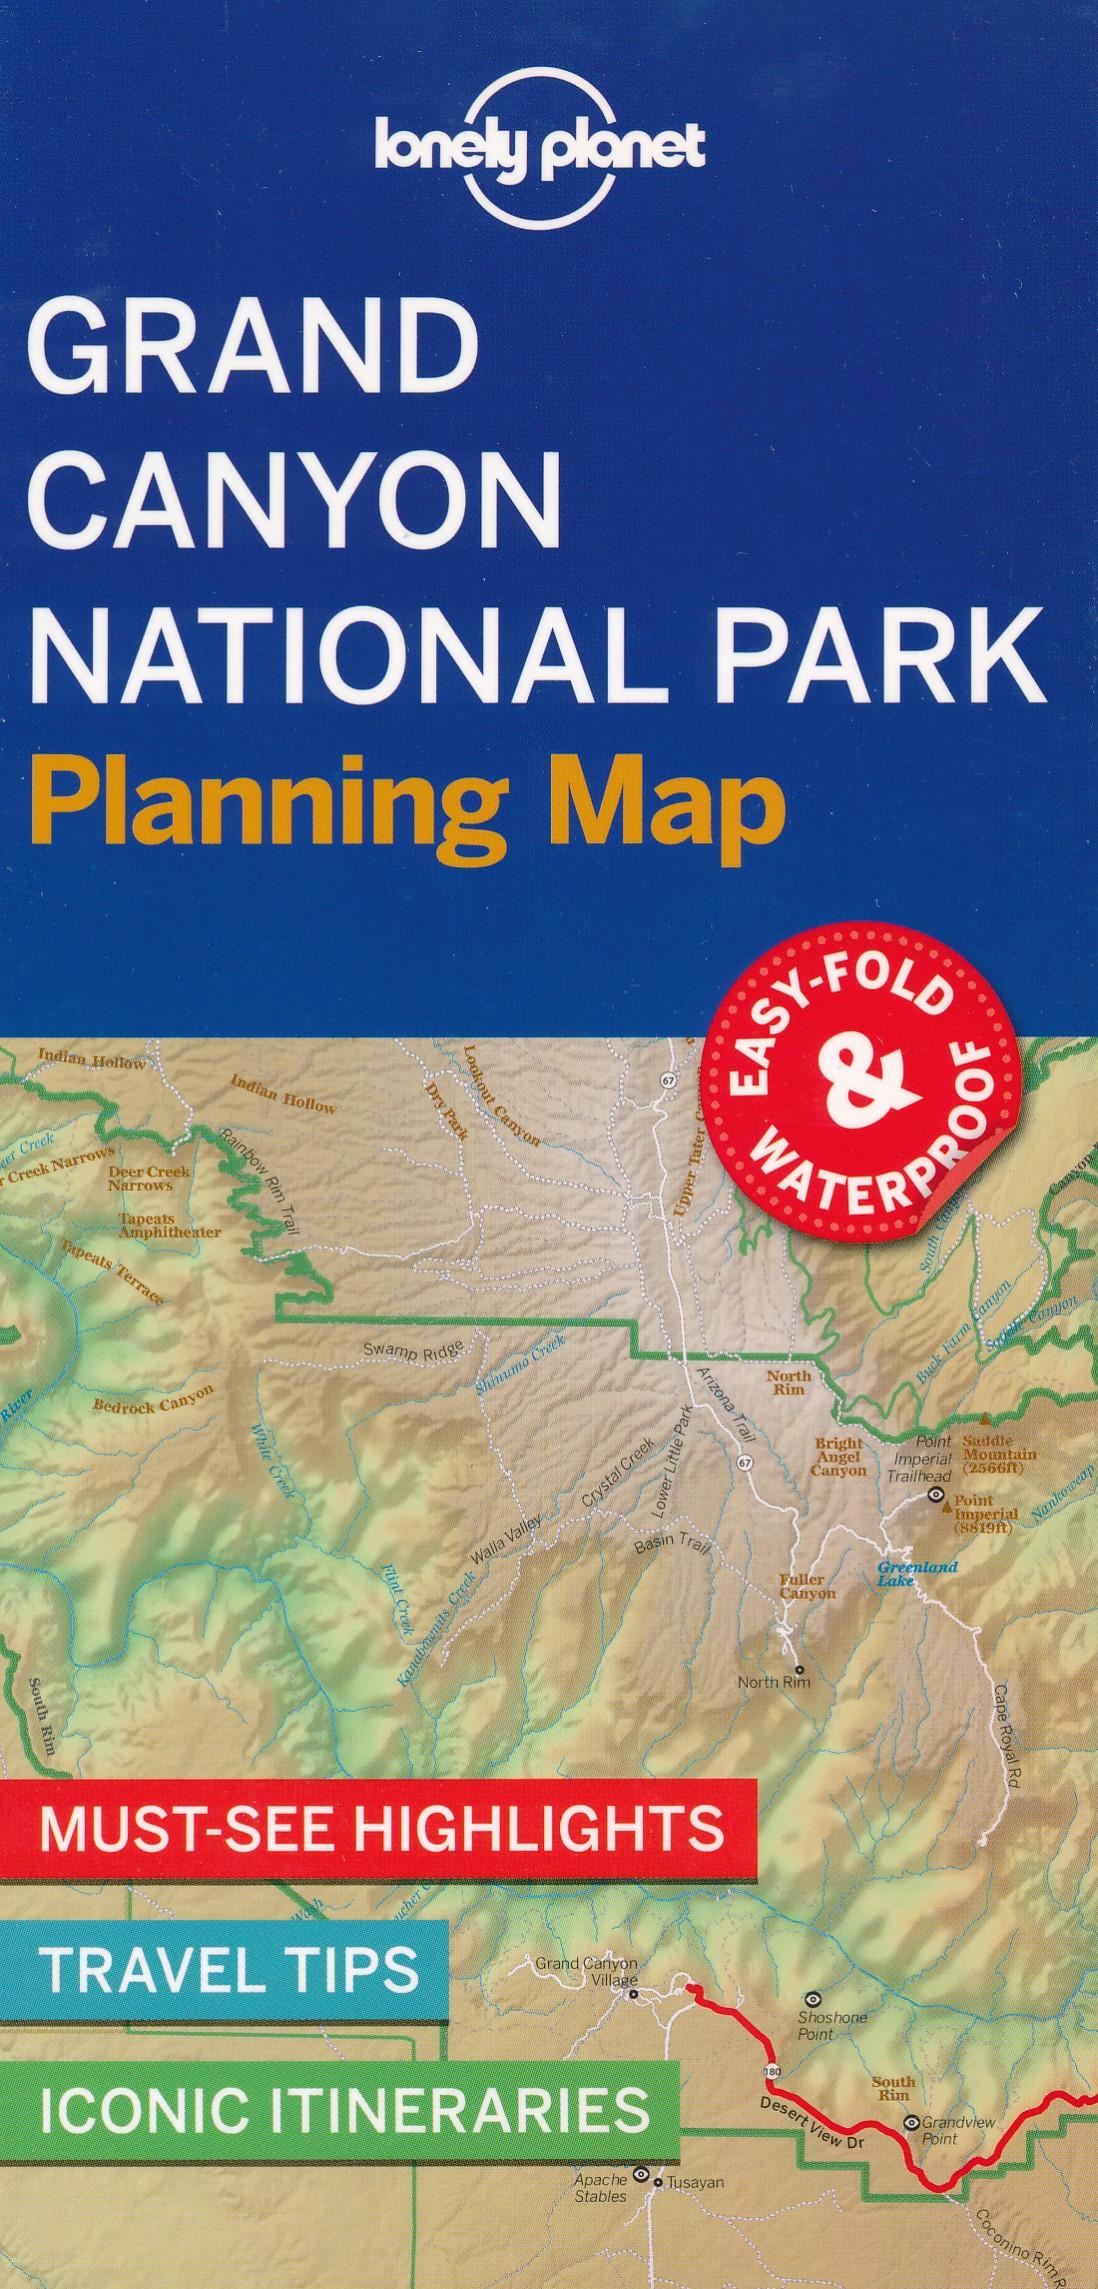 Wegenkaart - landkaart Planning Map Grand Canyon National Park | Lonely Planet